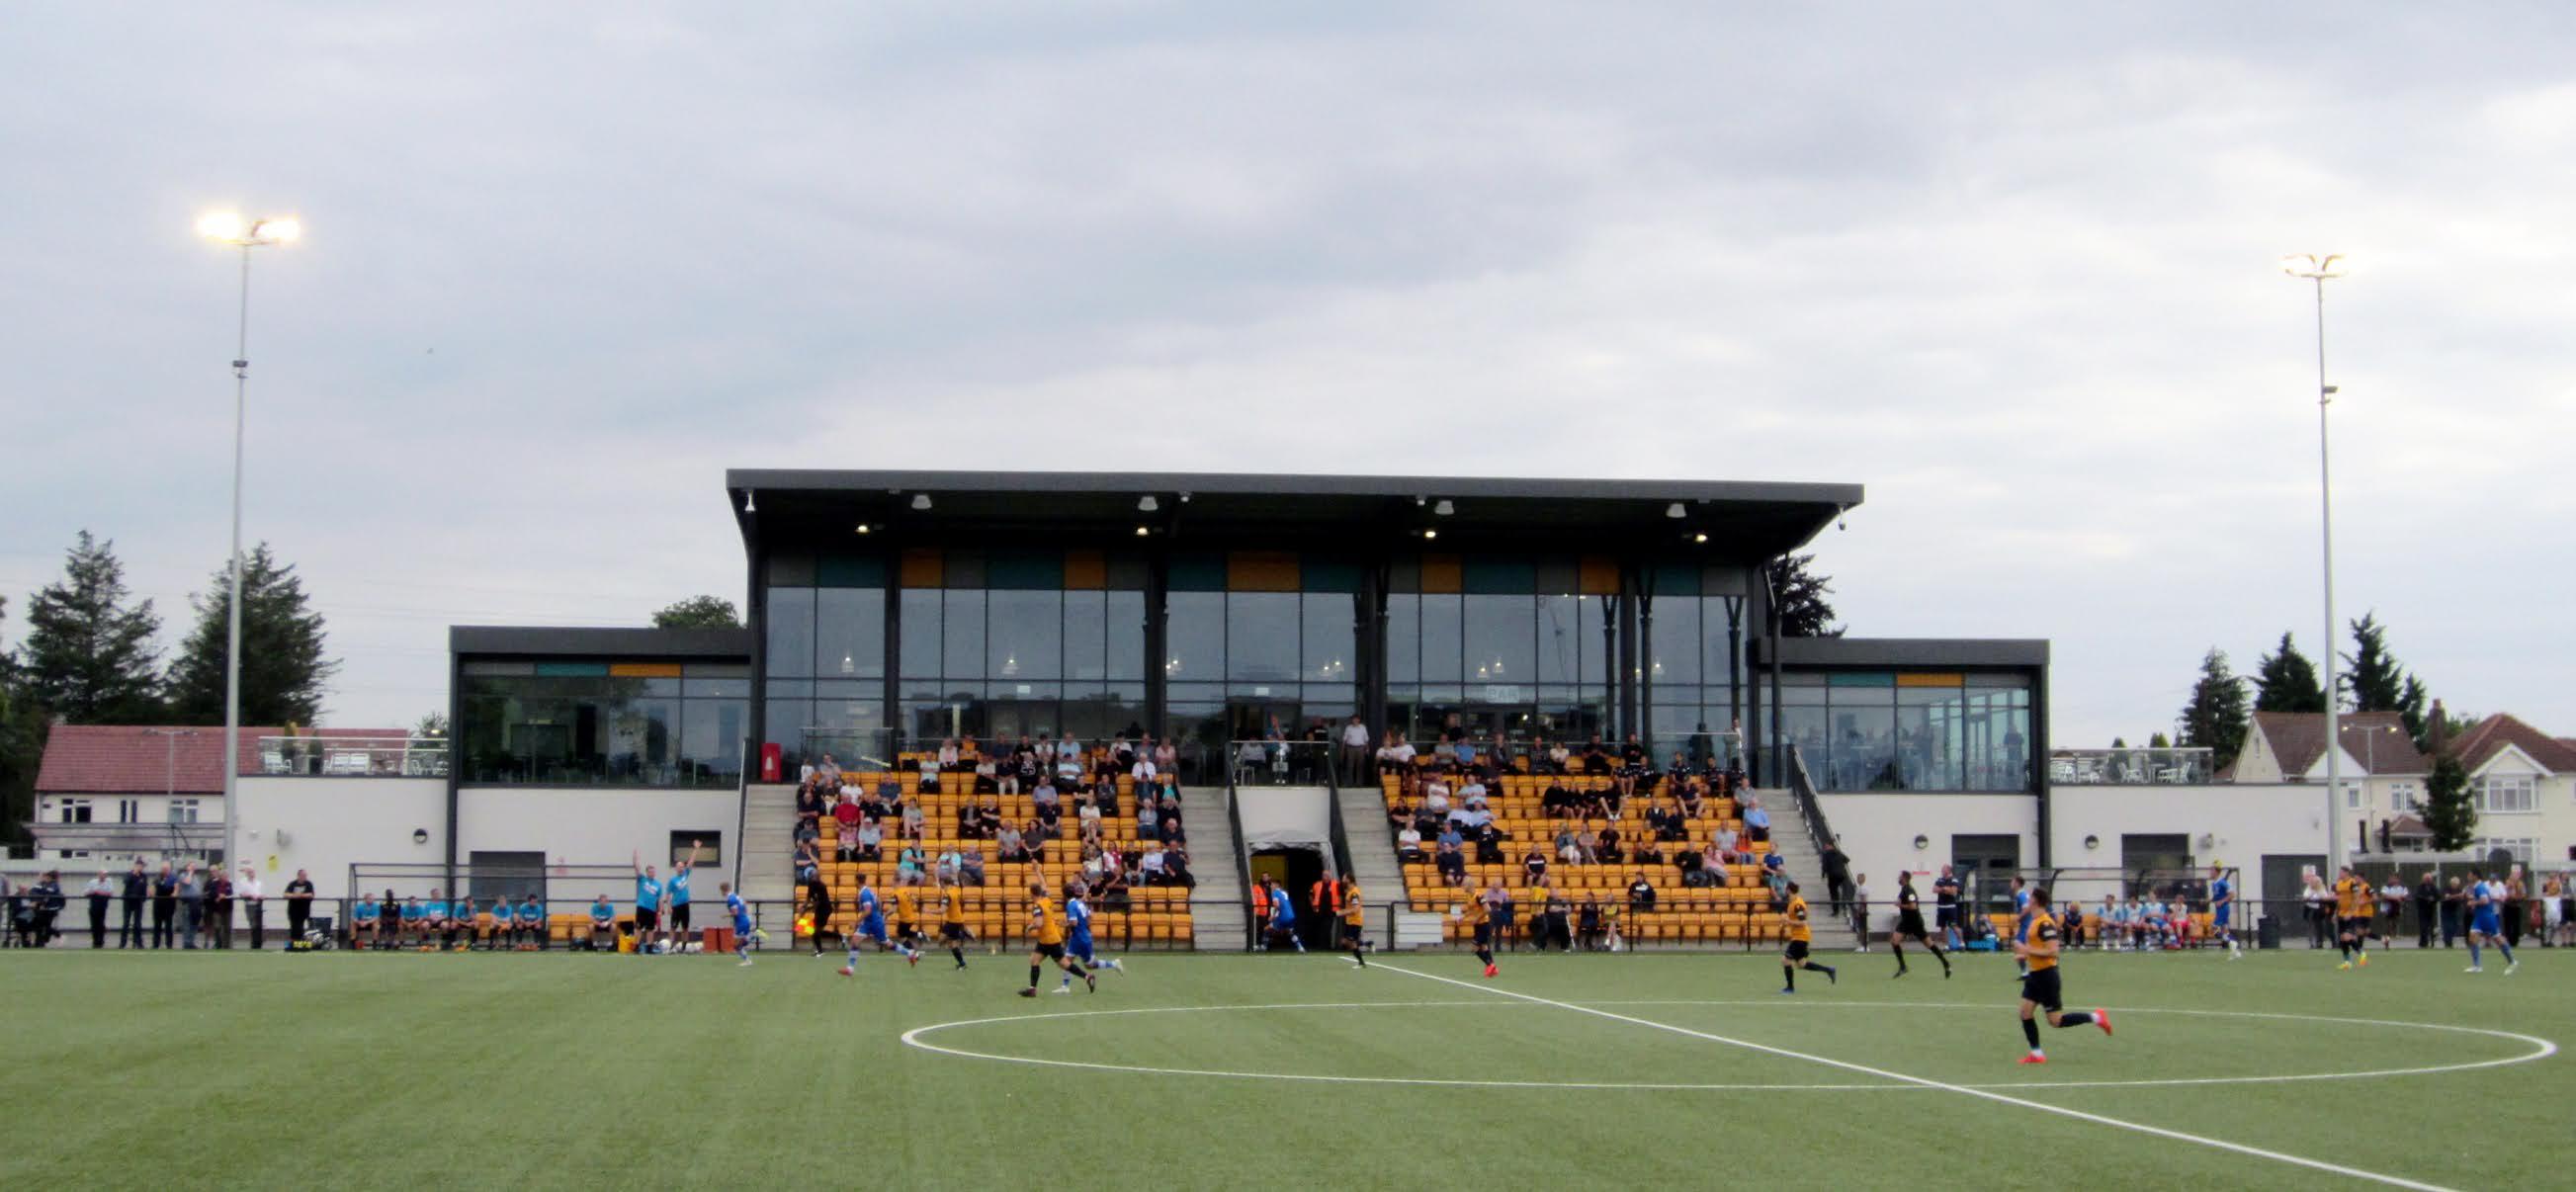 A closer photo of Arbour Park's main stand